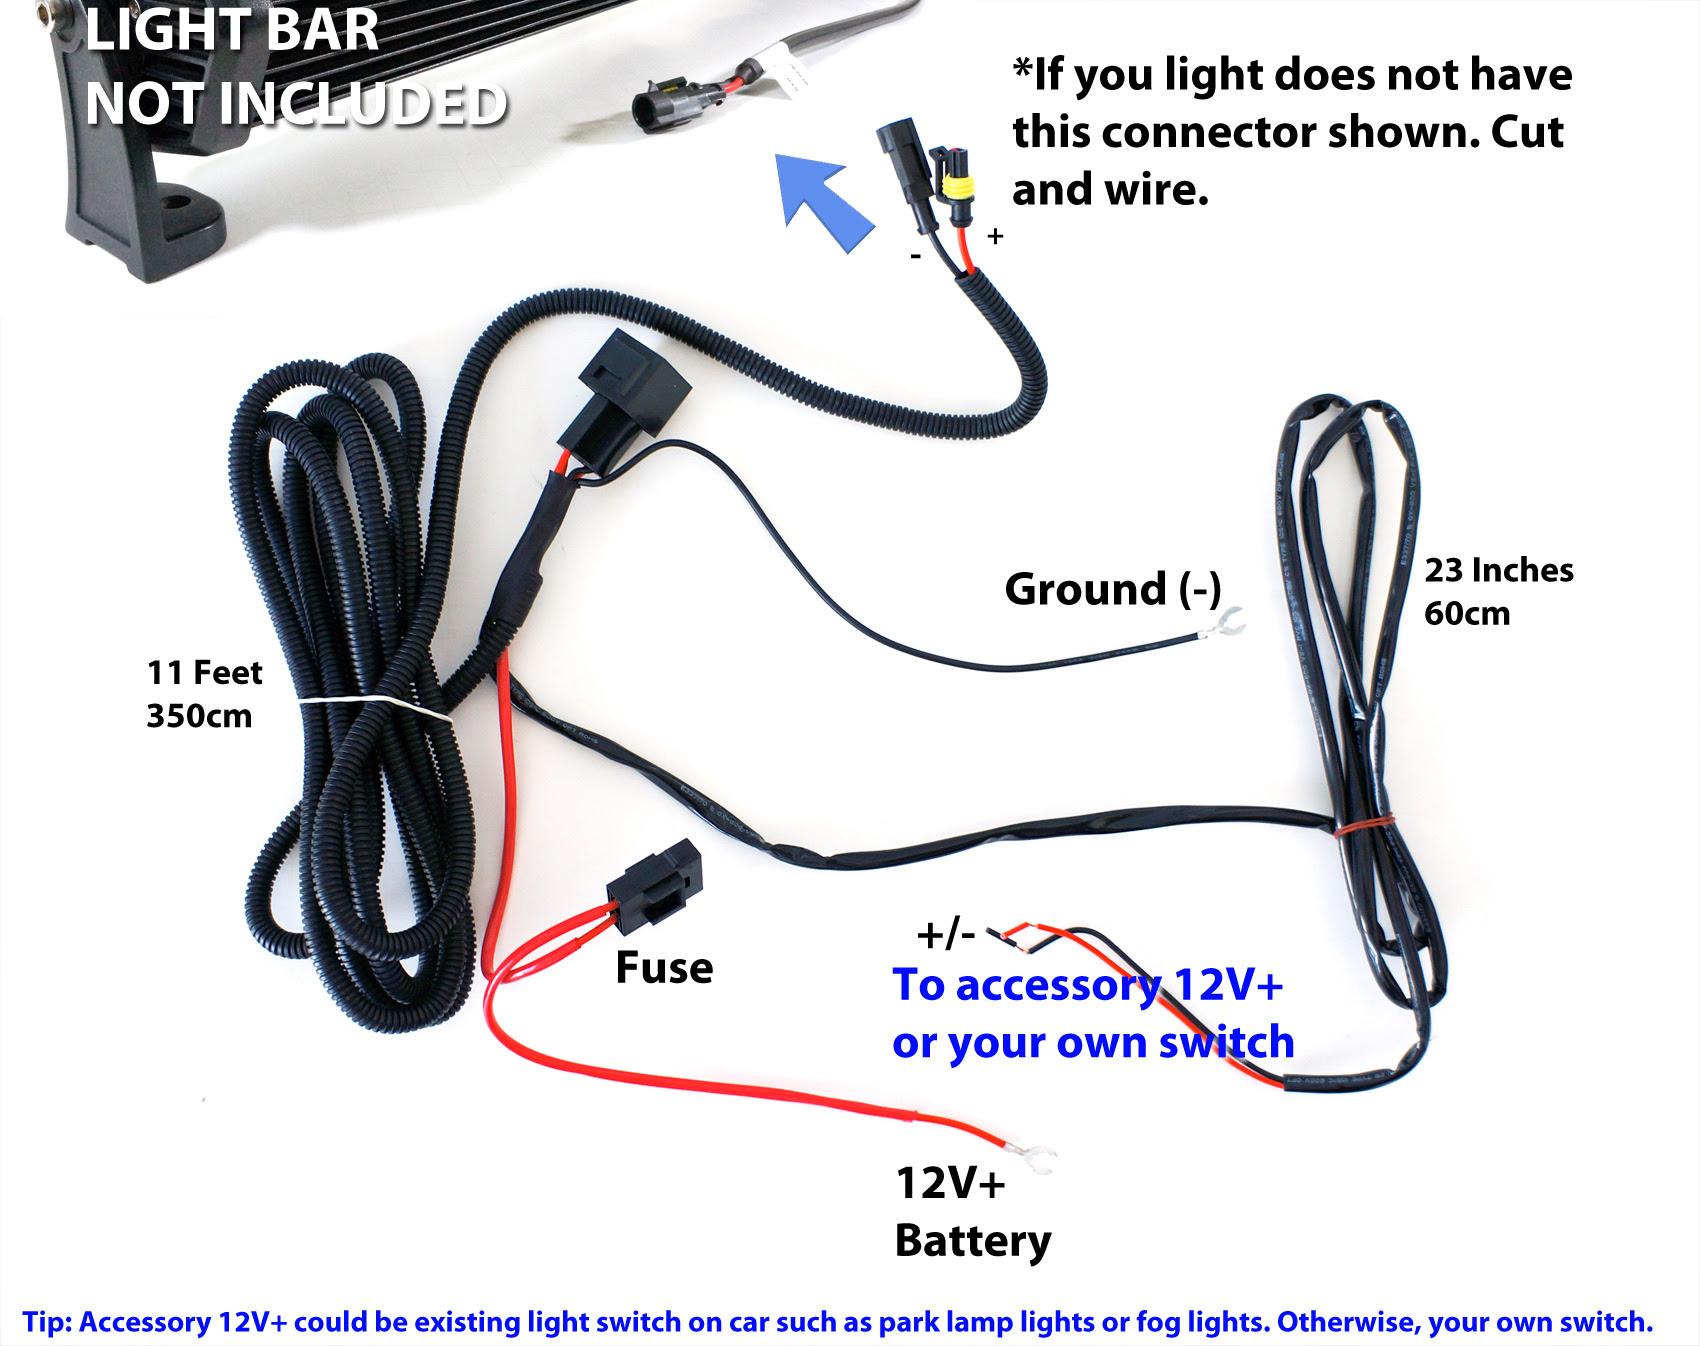 Diagram 50 Inch Led Light Bar Wiring Diagram Full Version Hd Quality Wiring Diagram Mentalrewiringl Sacom It